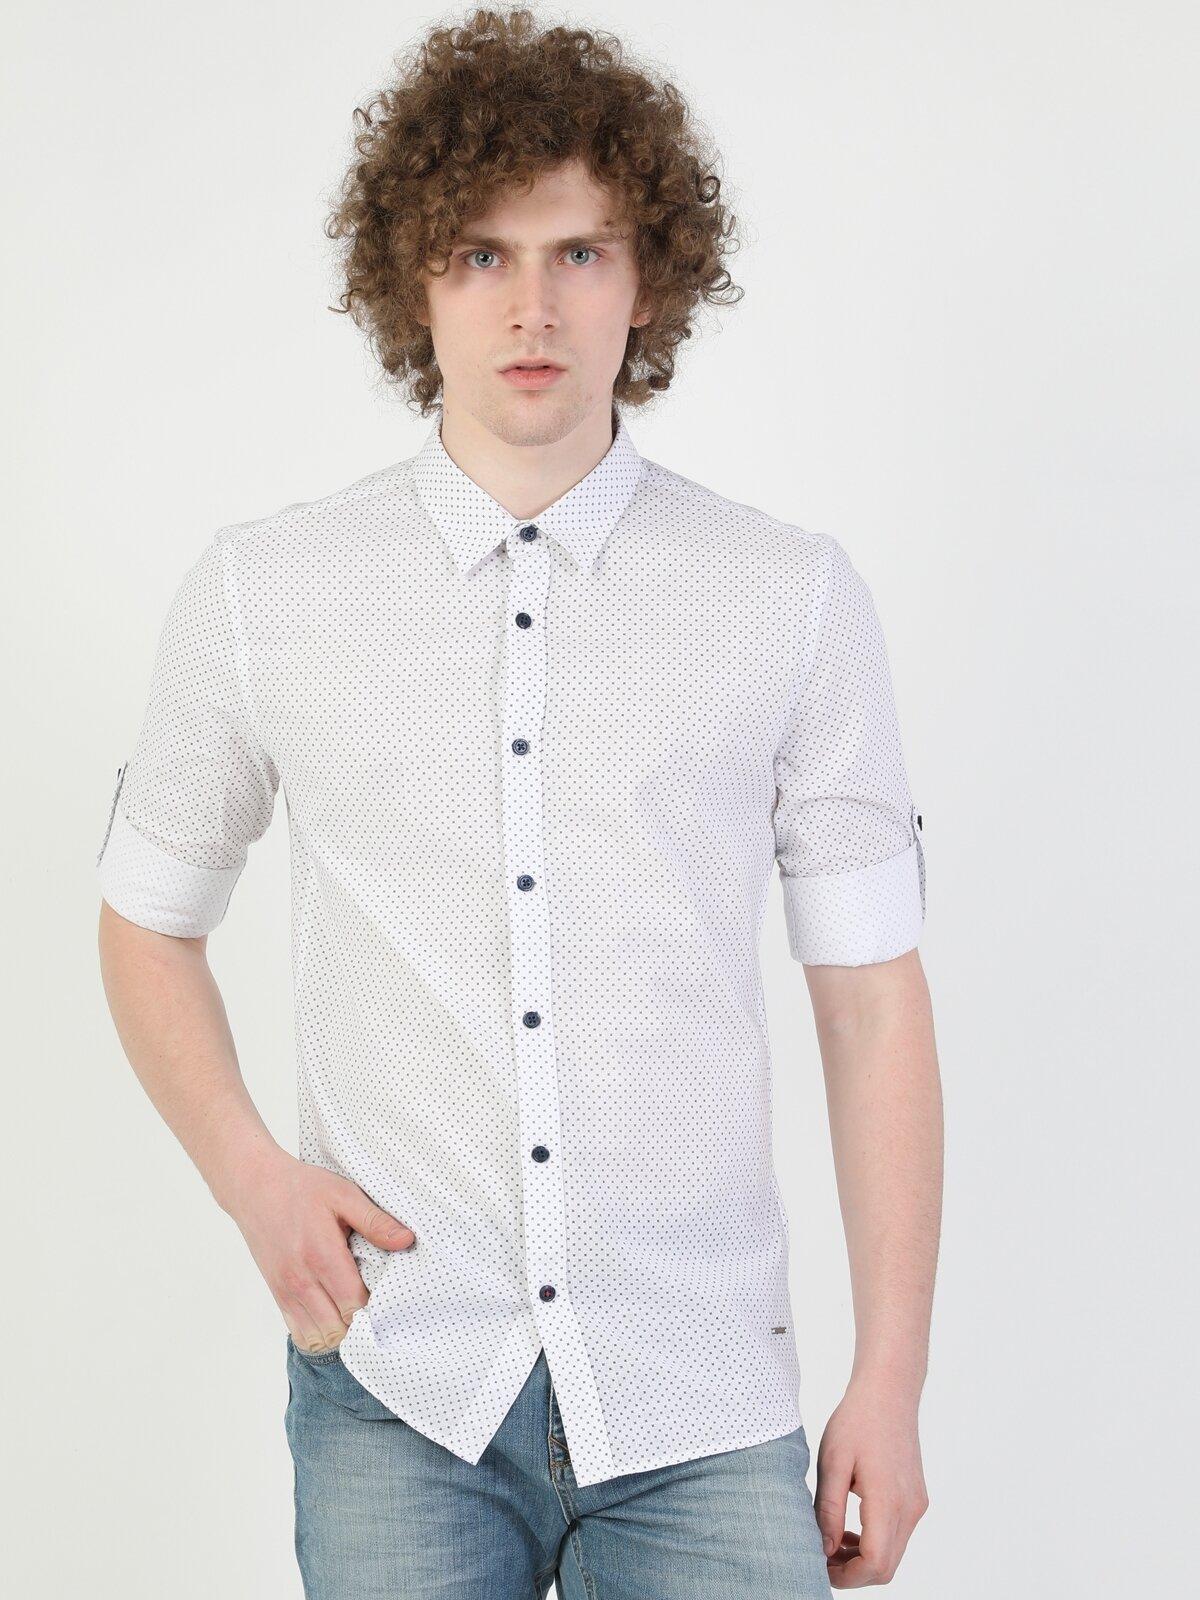 Super Slim Fit Shirt Neck Erkek Beyaz Uzun Kol Gömlek